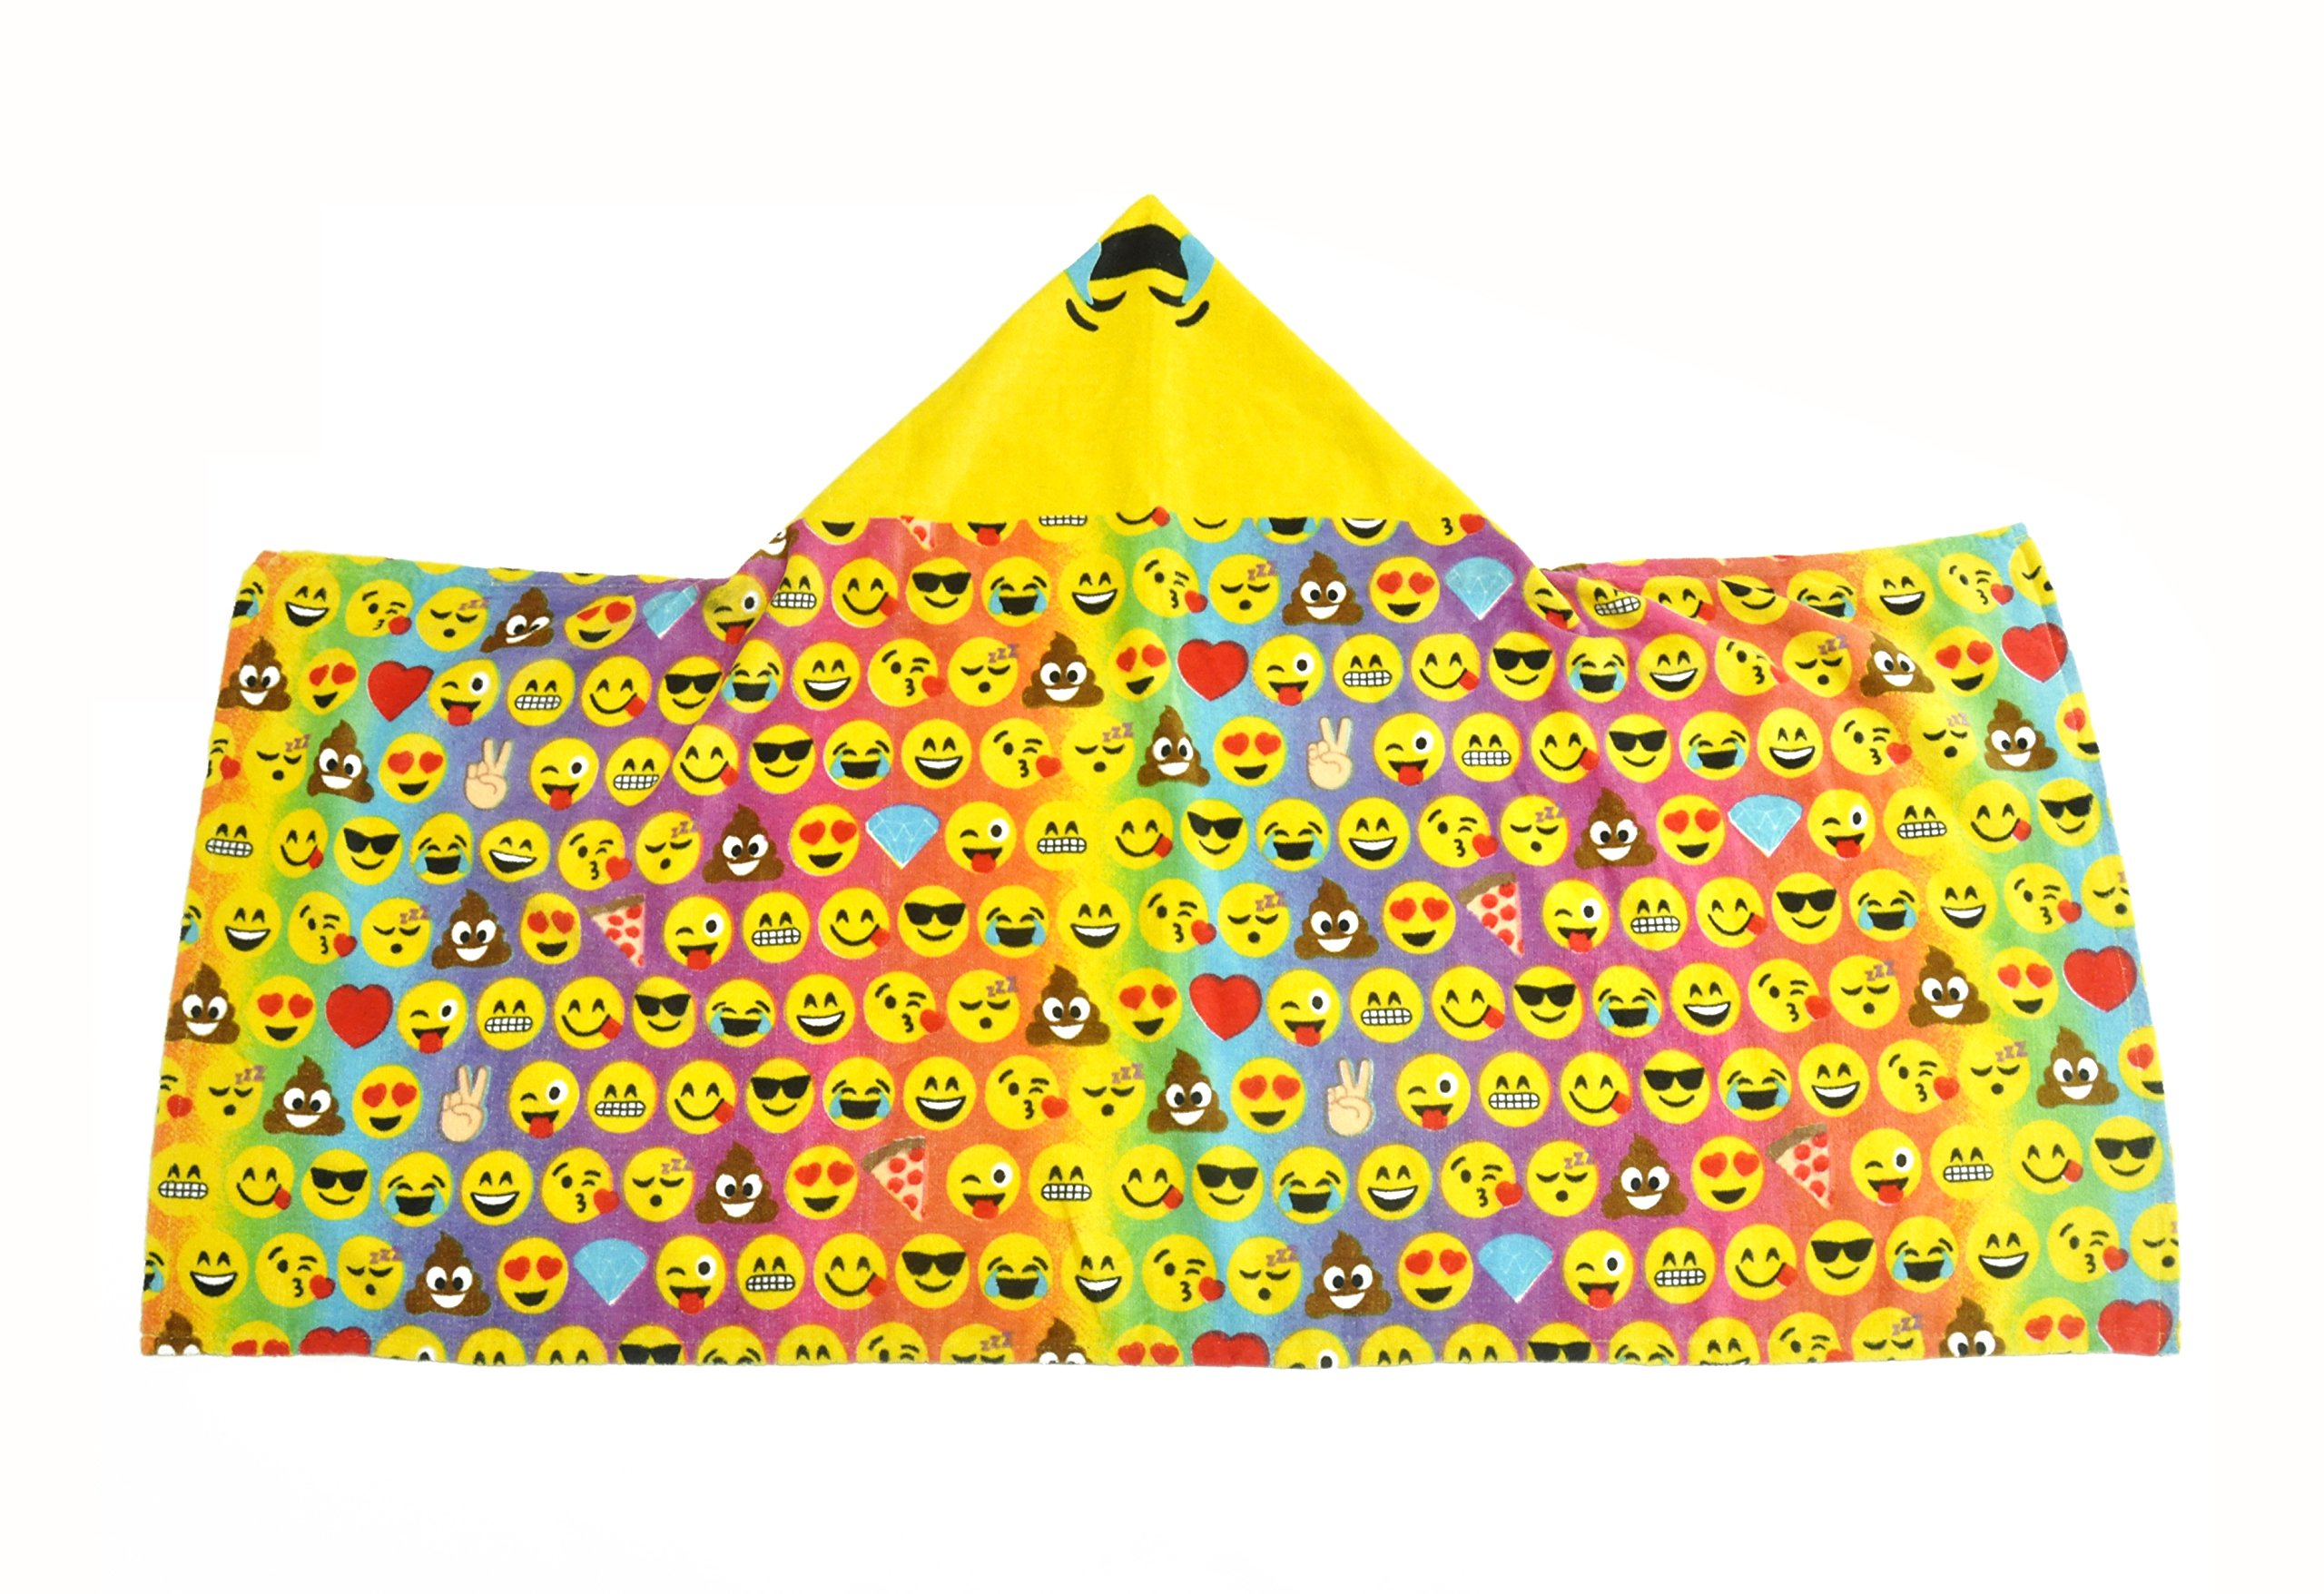 Emoji Pals  Rainbow Hooded Towel, Multicolor by Emoji Pals (Image #2)